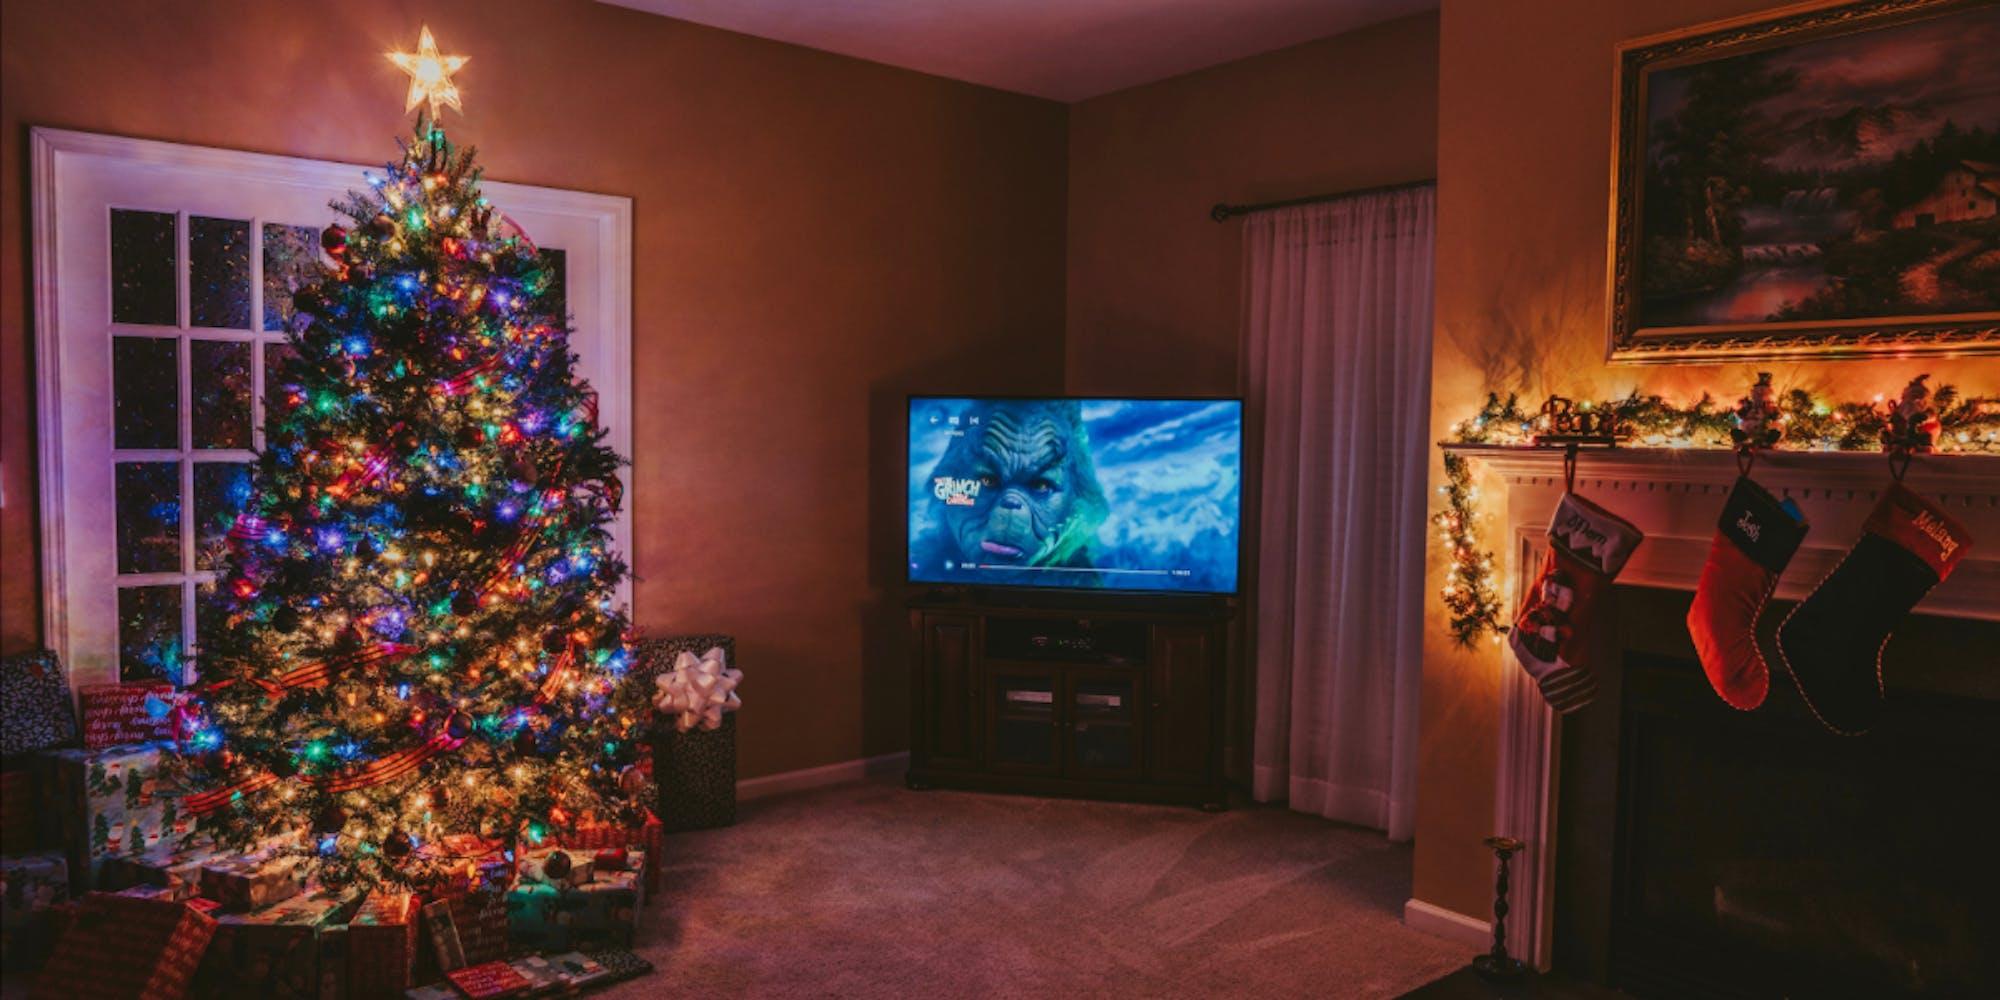 Binge watching the grinch on christmas